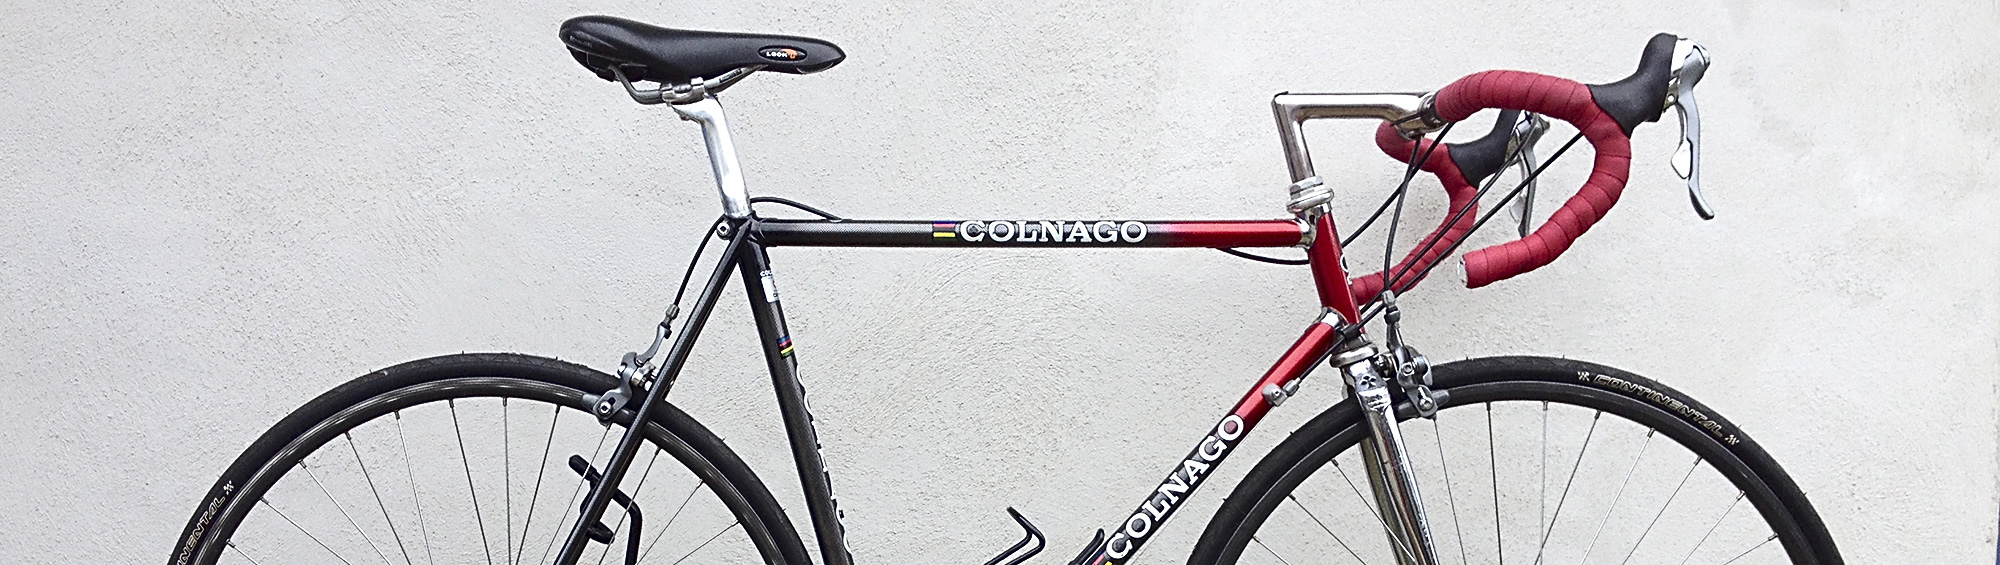 Bartandbikes Colnago XL